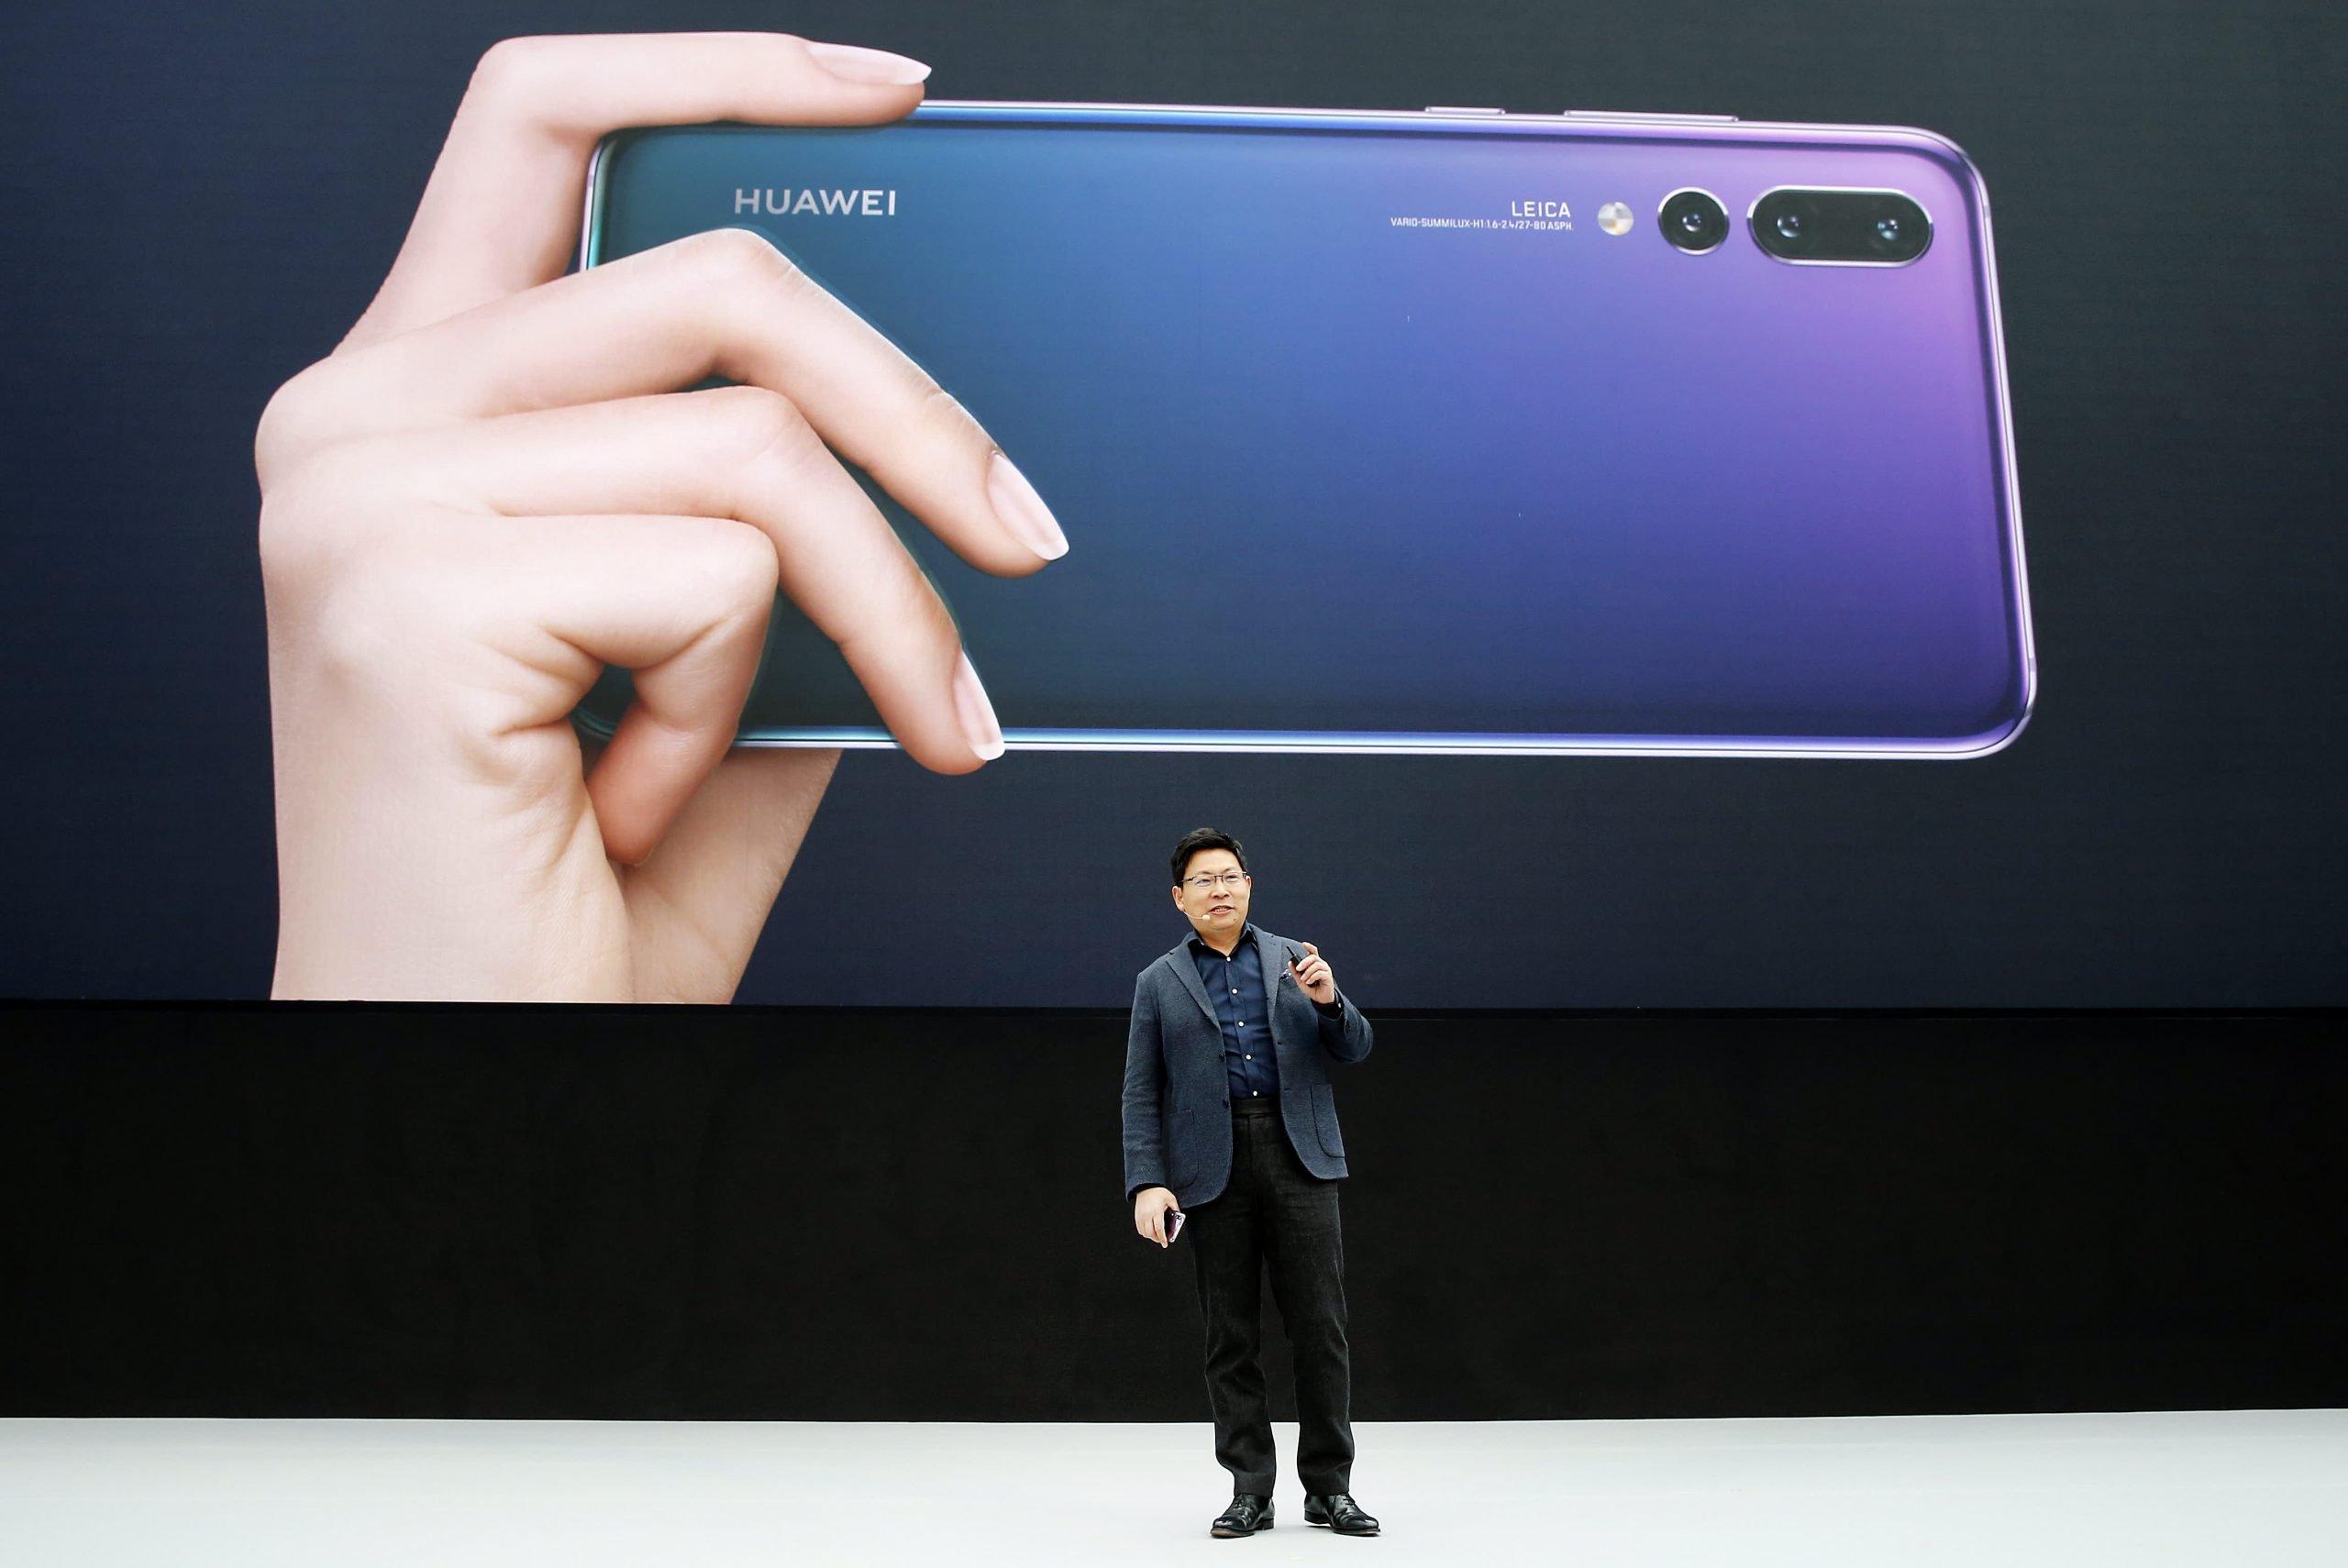 Huawei Smartphone Will Lose Google